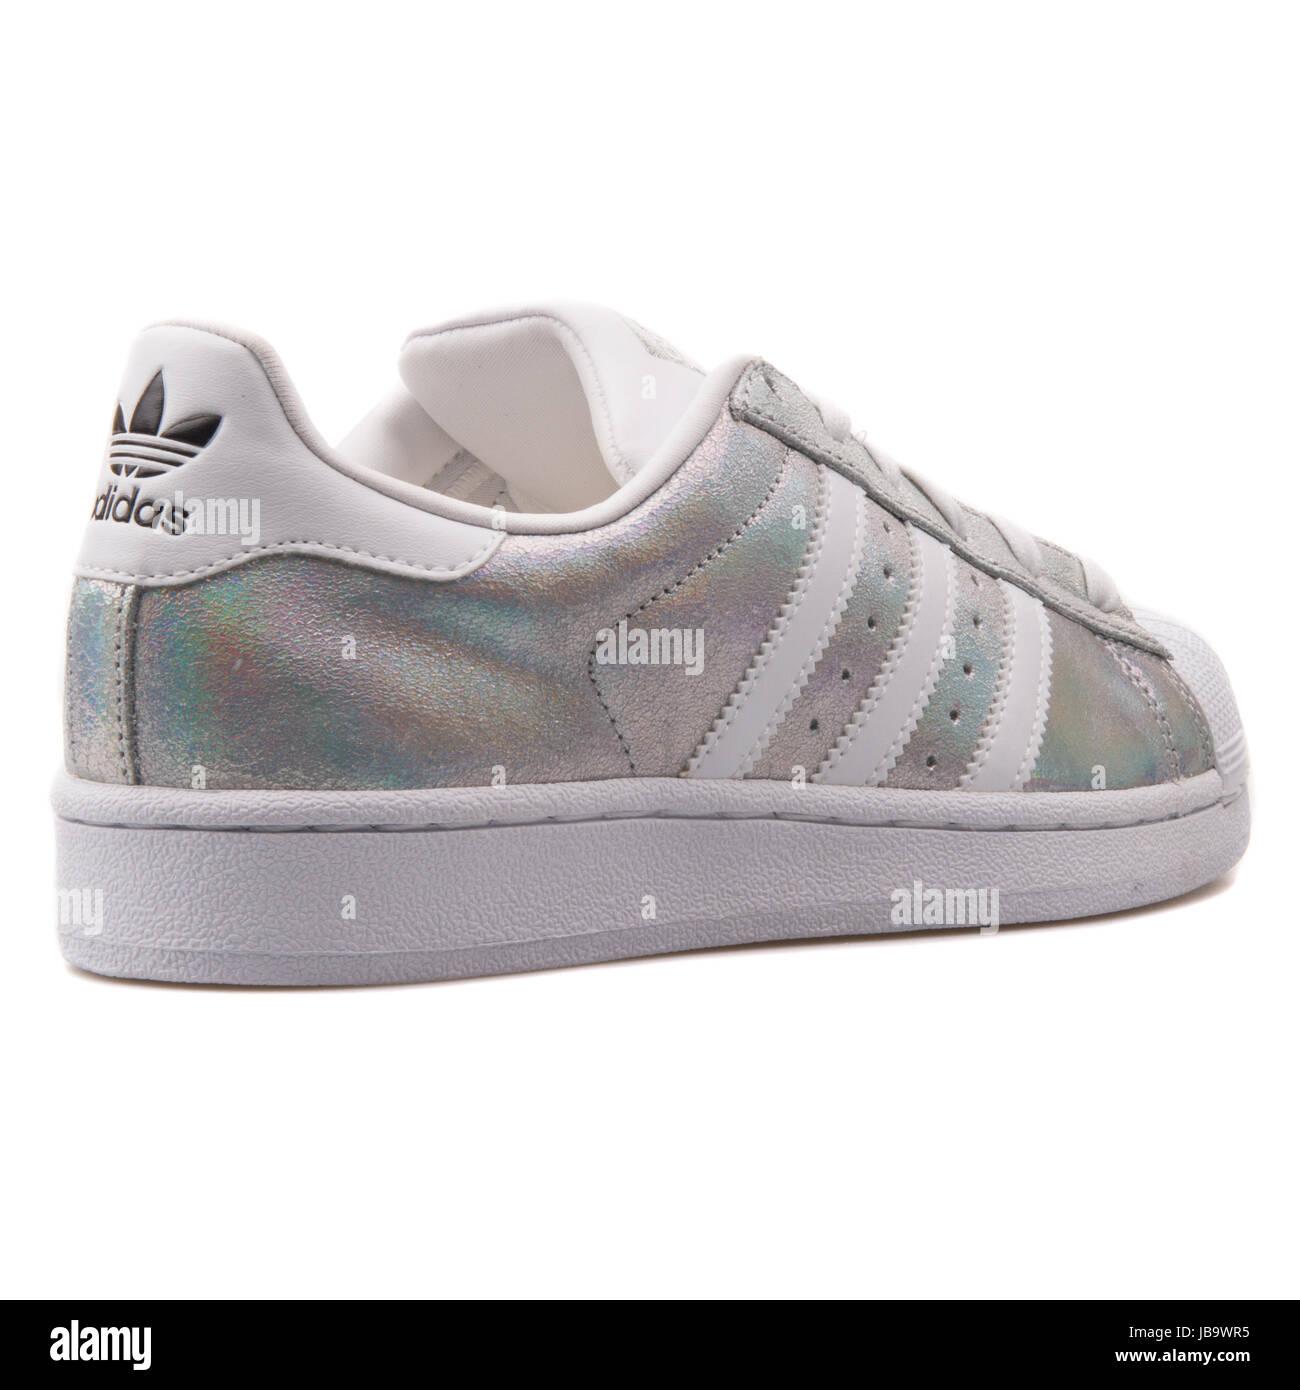 buy popular f844a 9a586 Adidas Superstar W Hologram Iridescent Women's Shoes ...